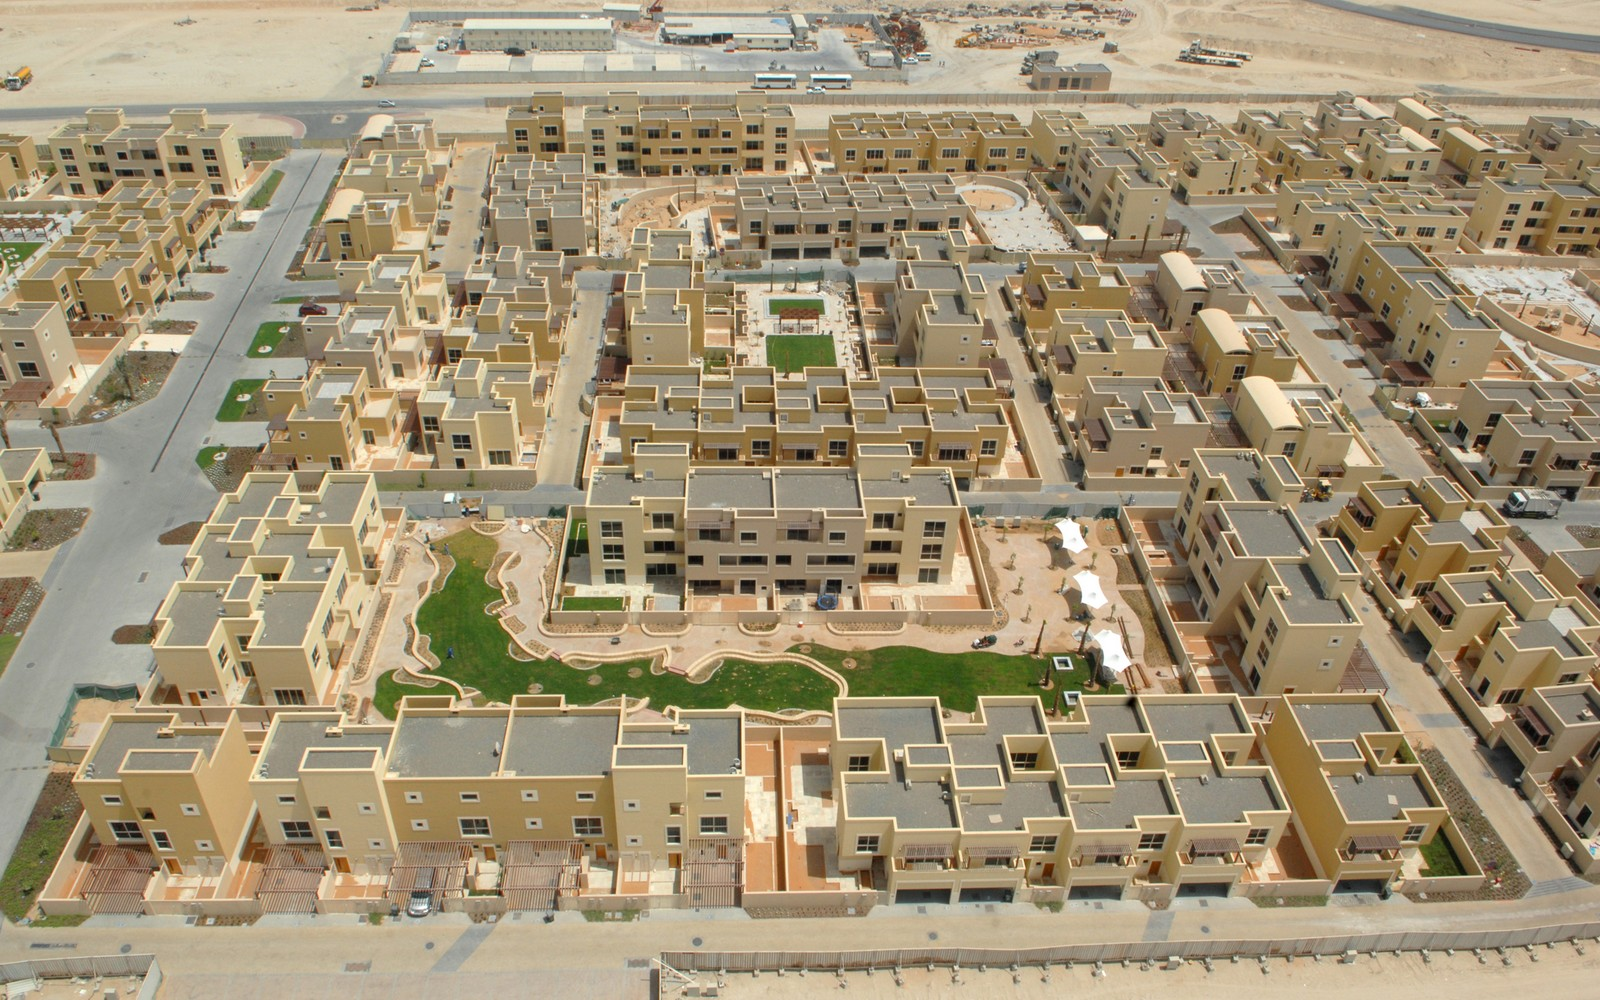 AL JABER BUILDING